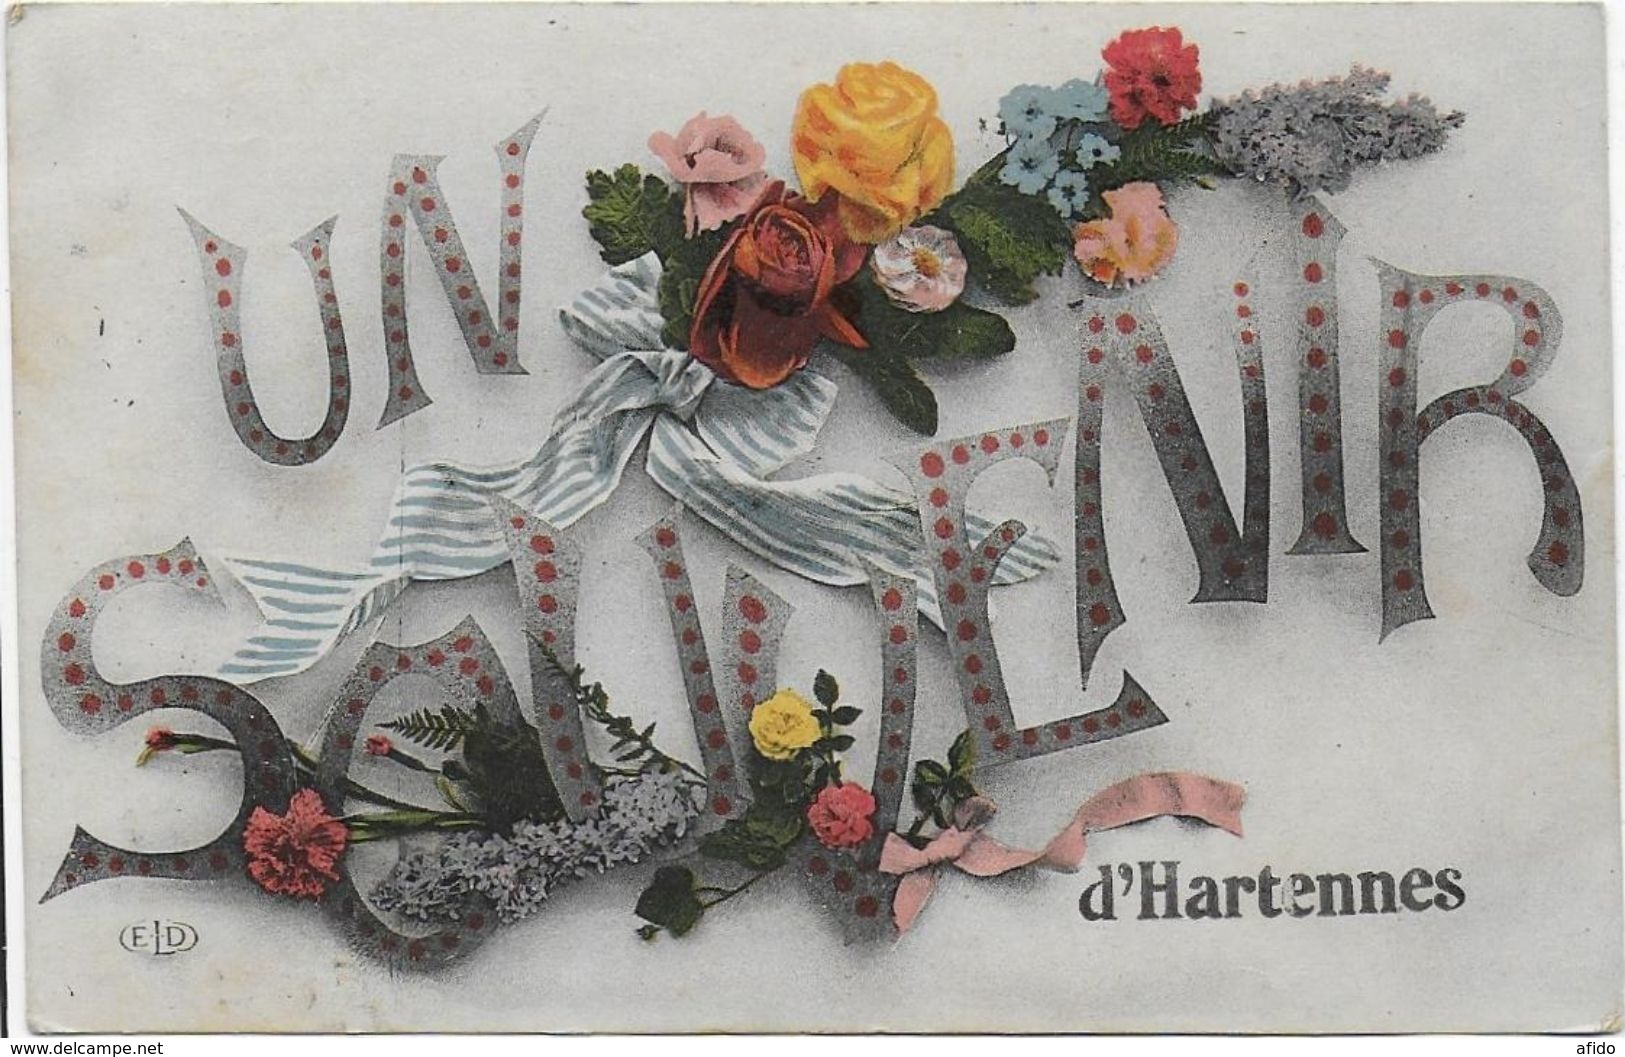 HARTENNES - France